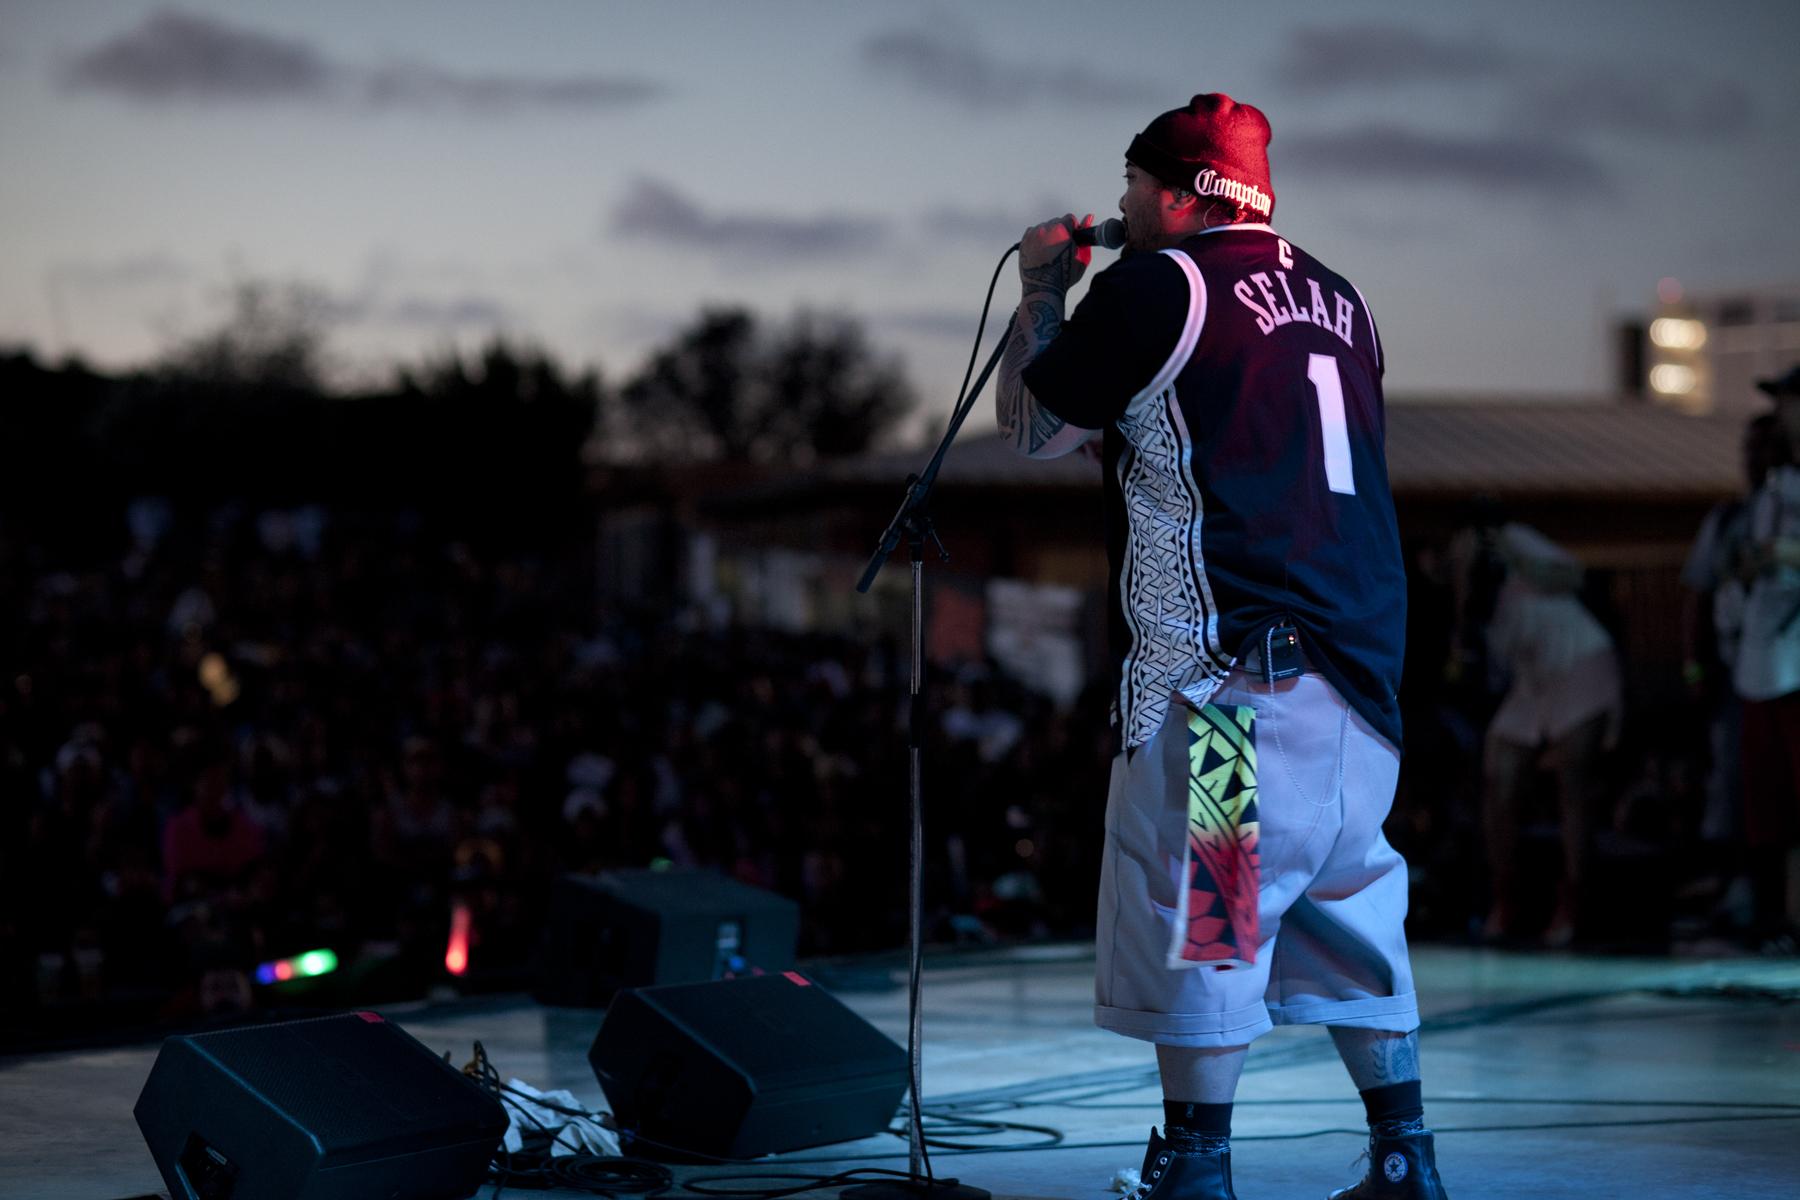 J Boog Reggae J Boog: Compton's Regg...